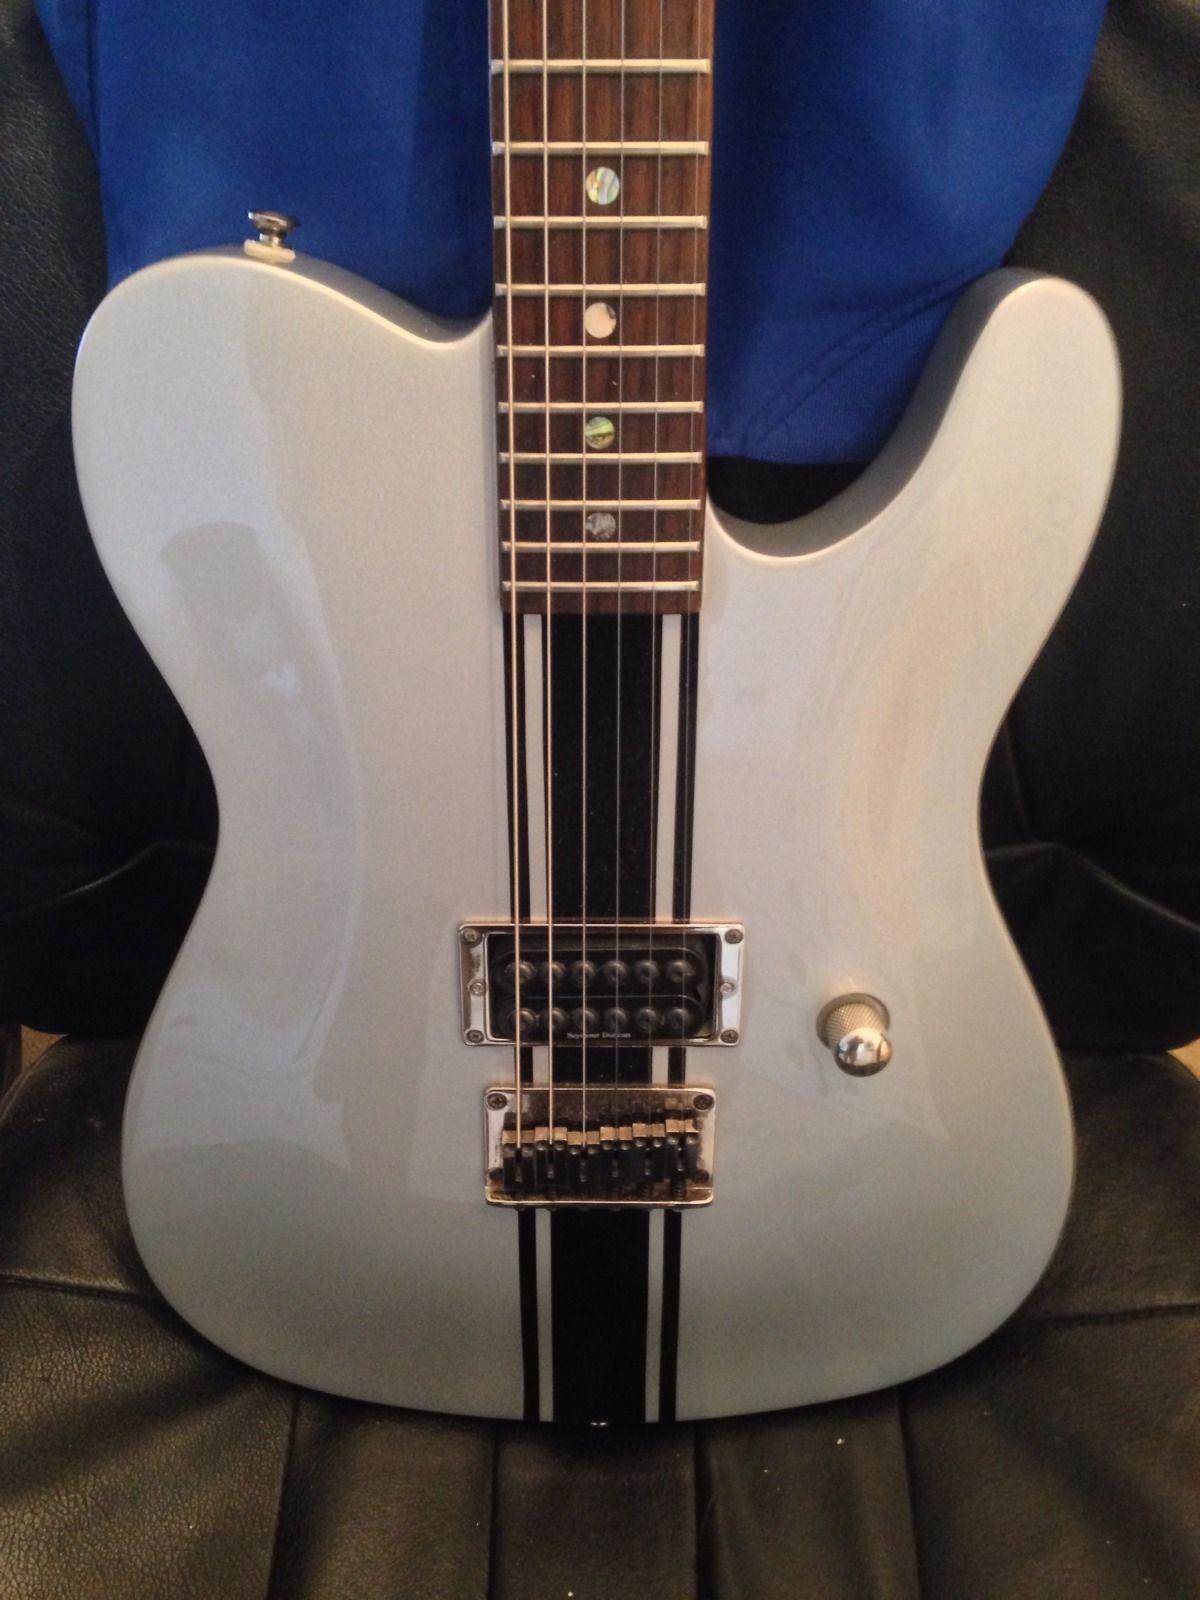 Rare 1980 S Fender Fully Bound Esquire Telecaster Mij Fujigen An